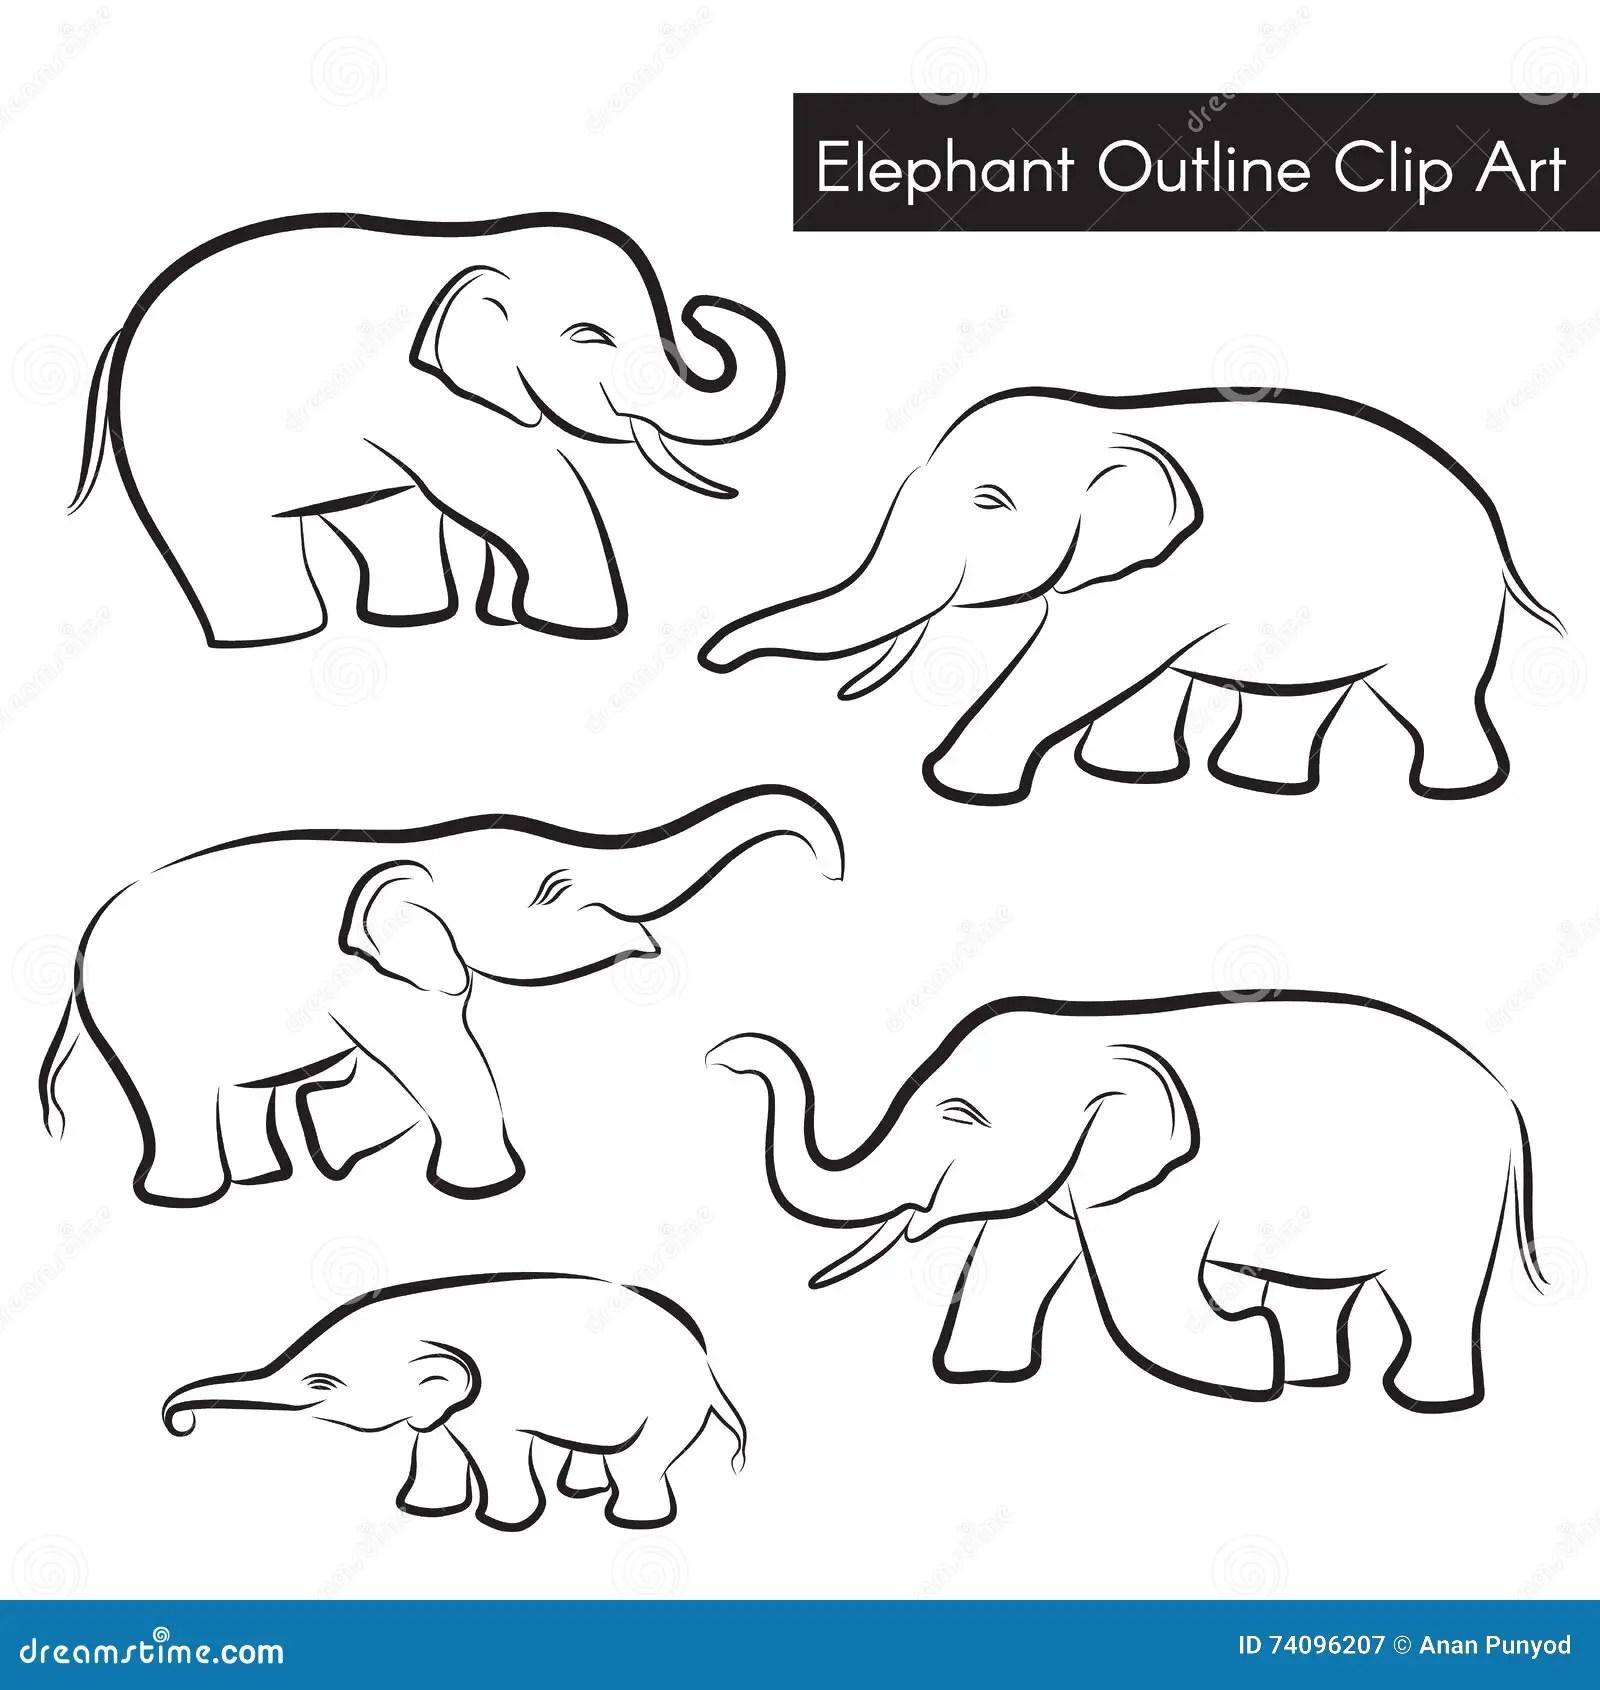 Cute Elephant Outline Clip Art Vector Set Design Stock